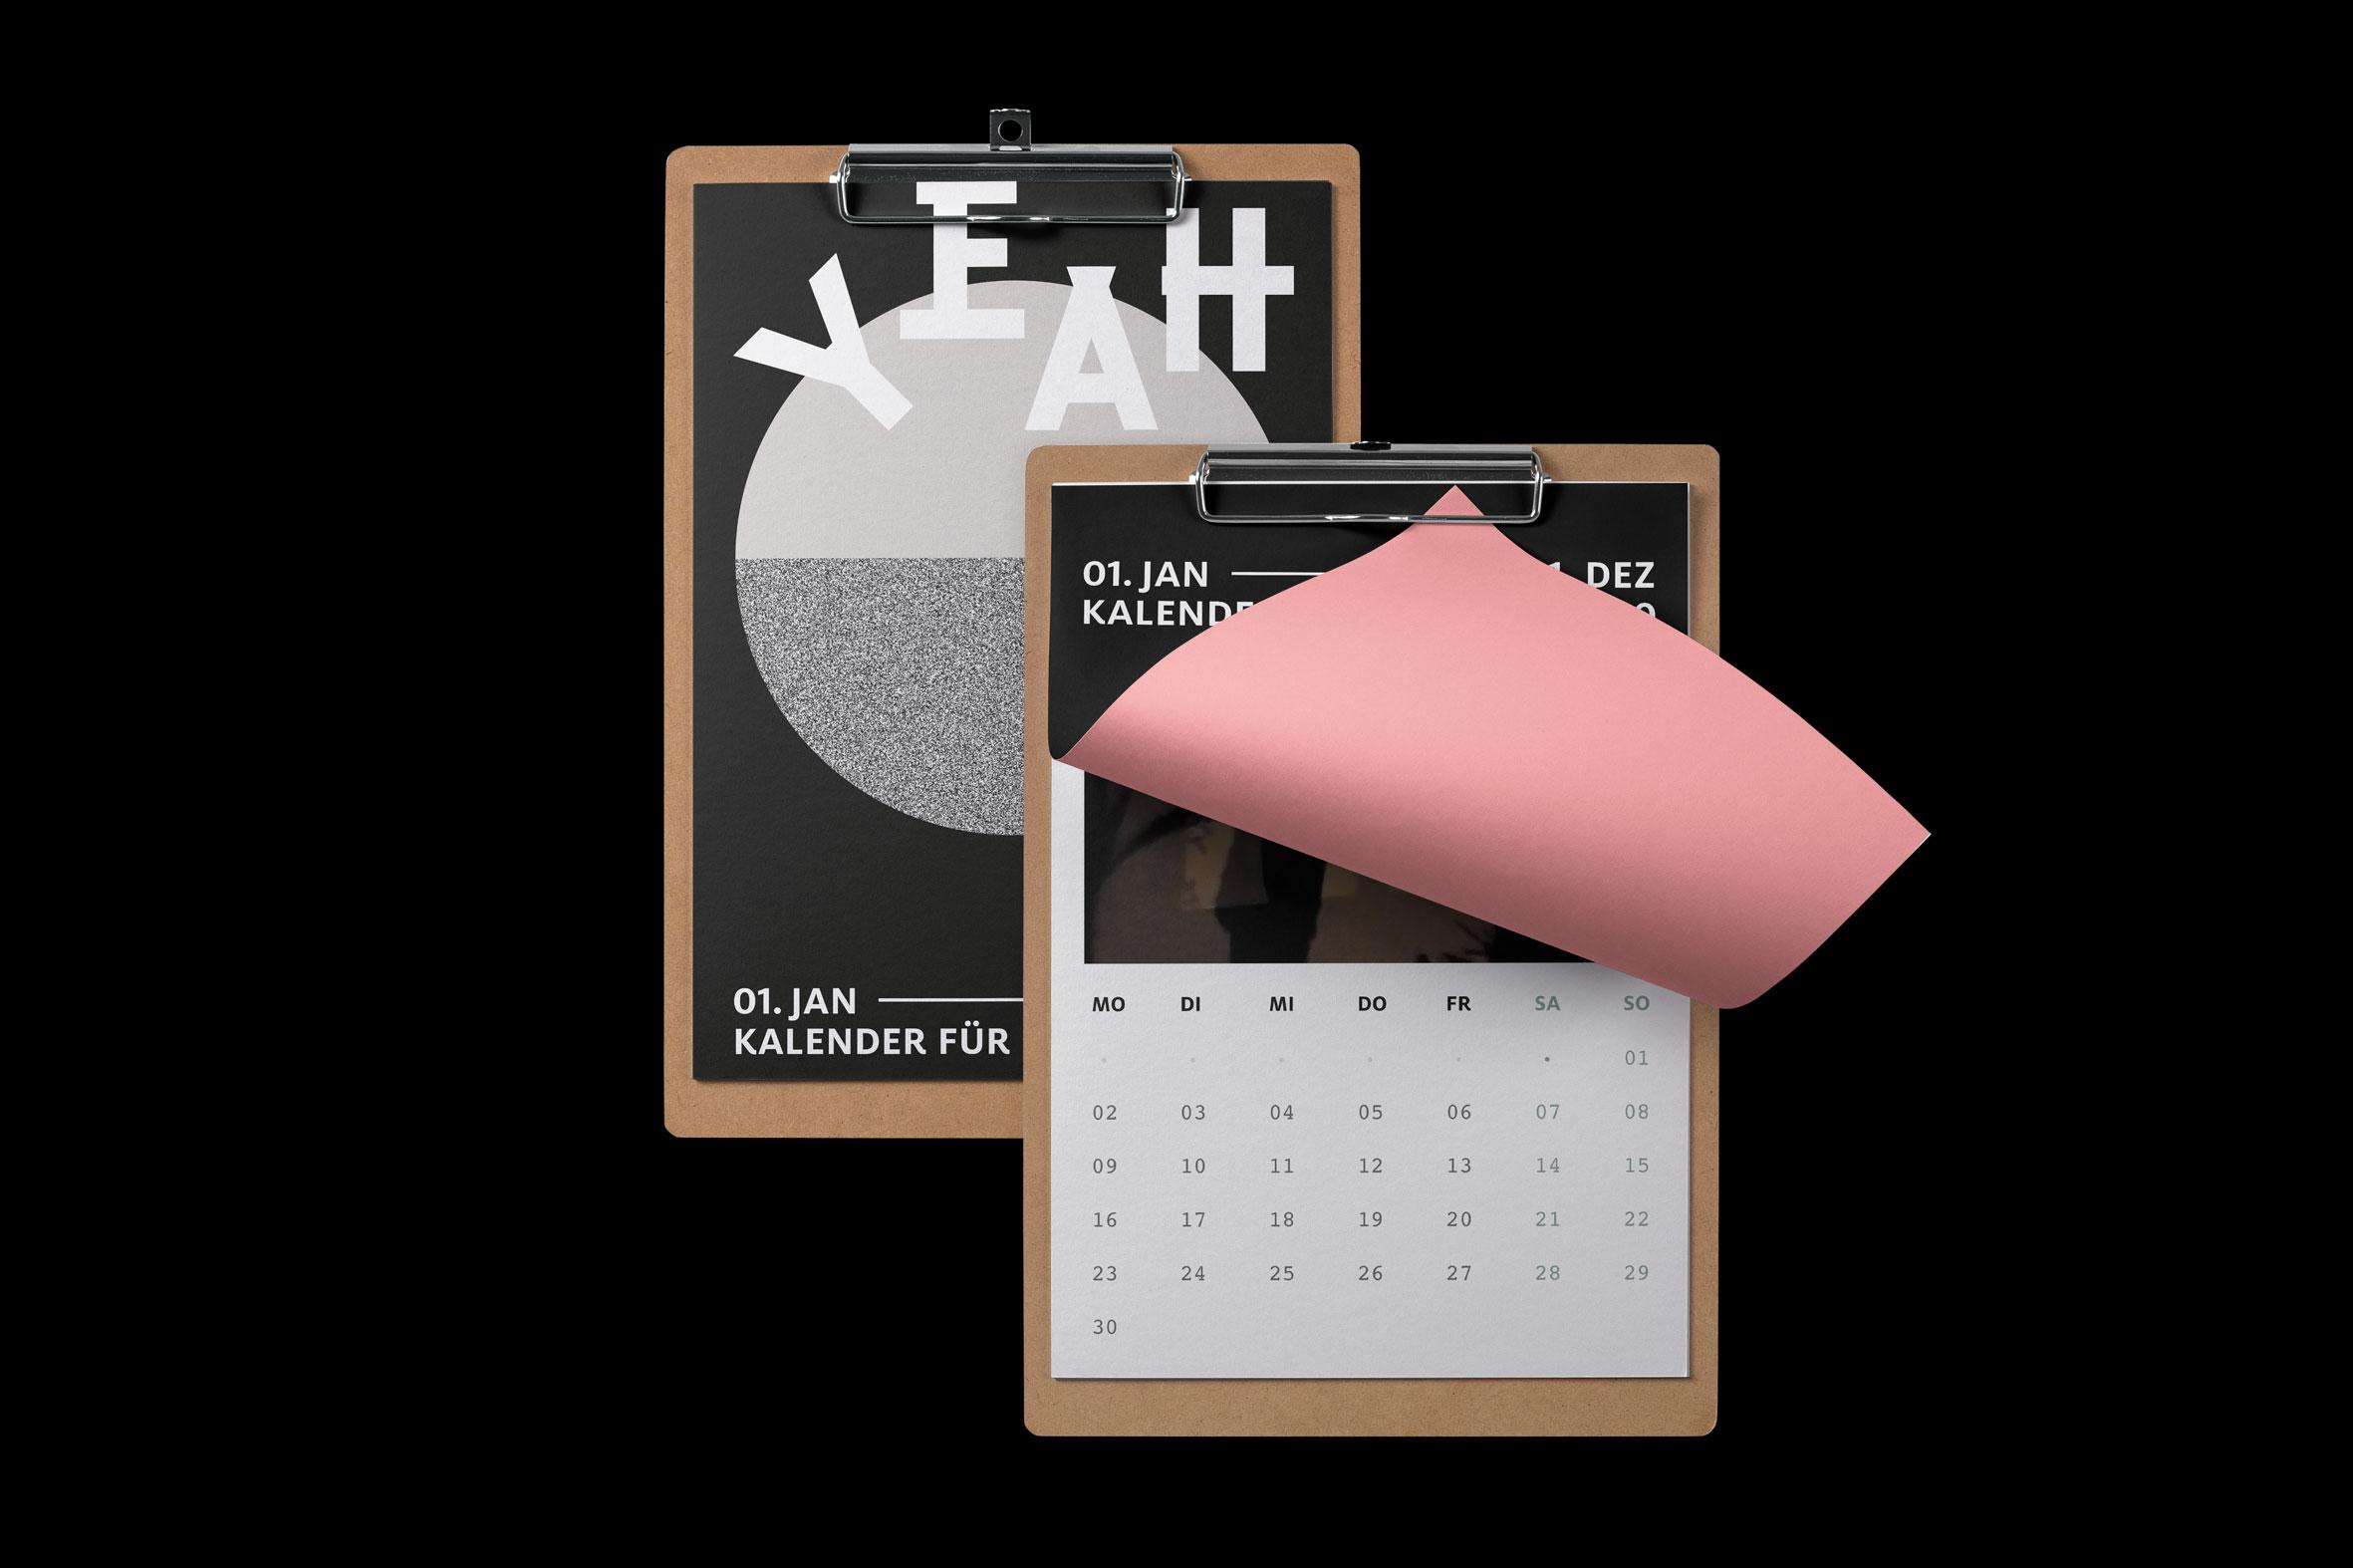 Kalender_01